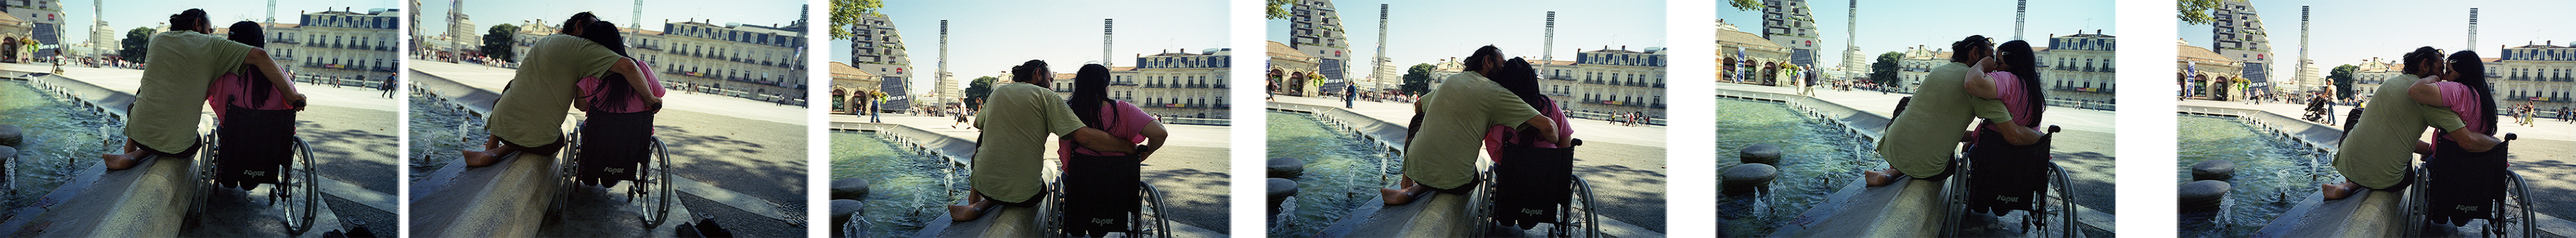 Montpellier, France. 2009Dimensioni: 195x18cm